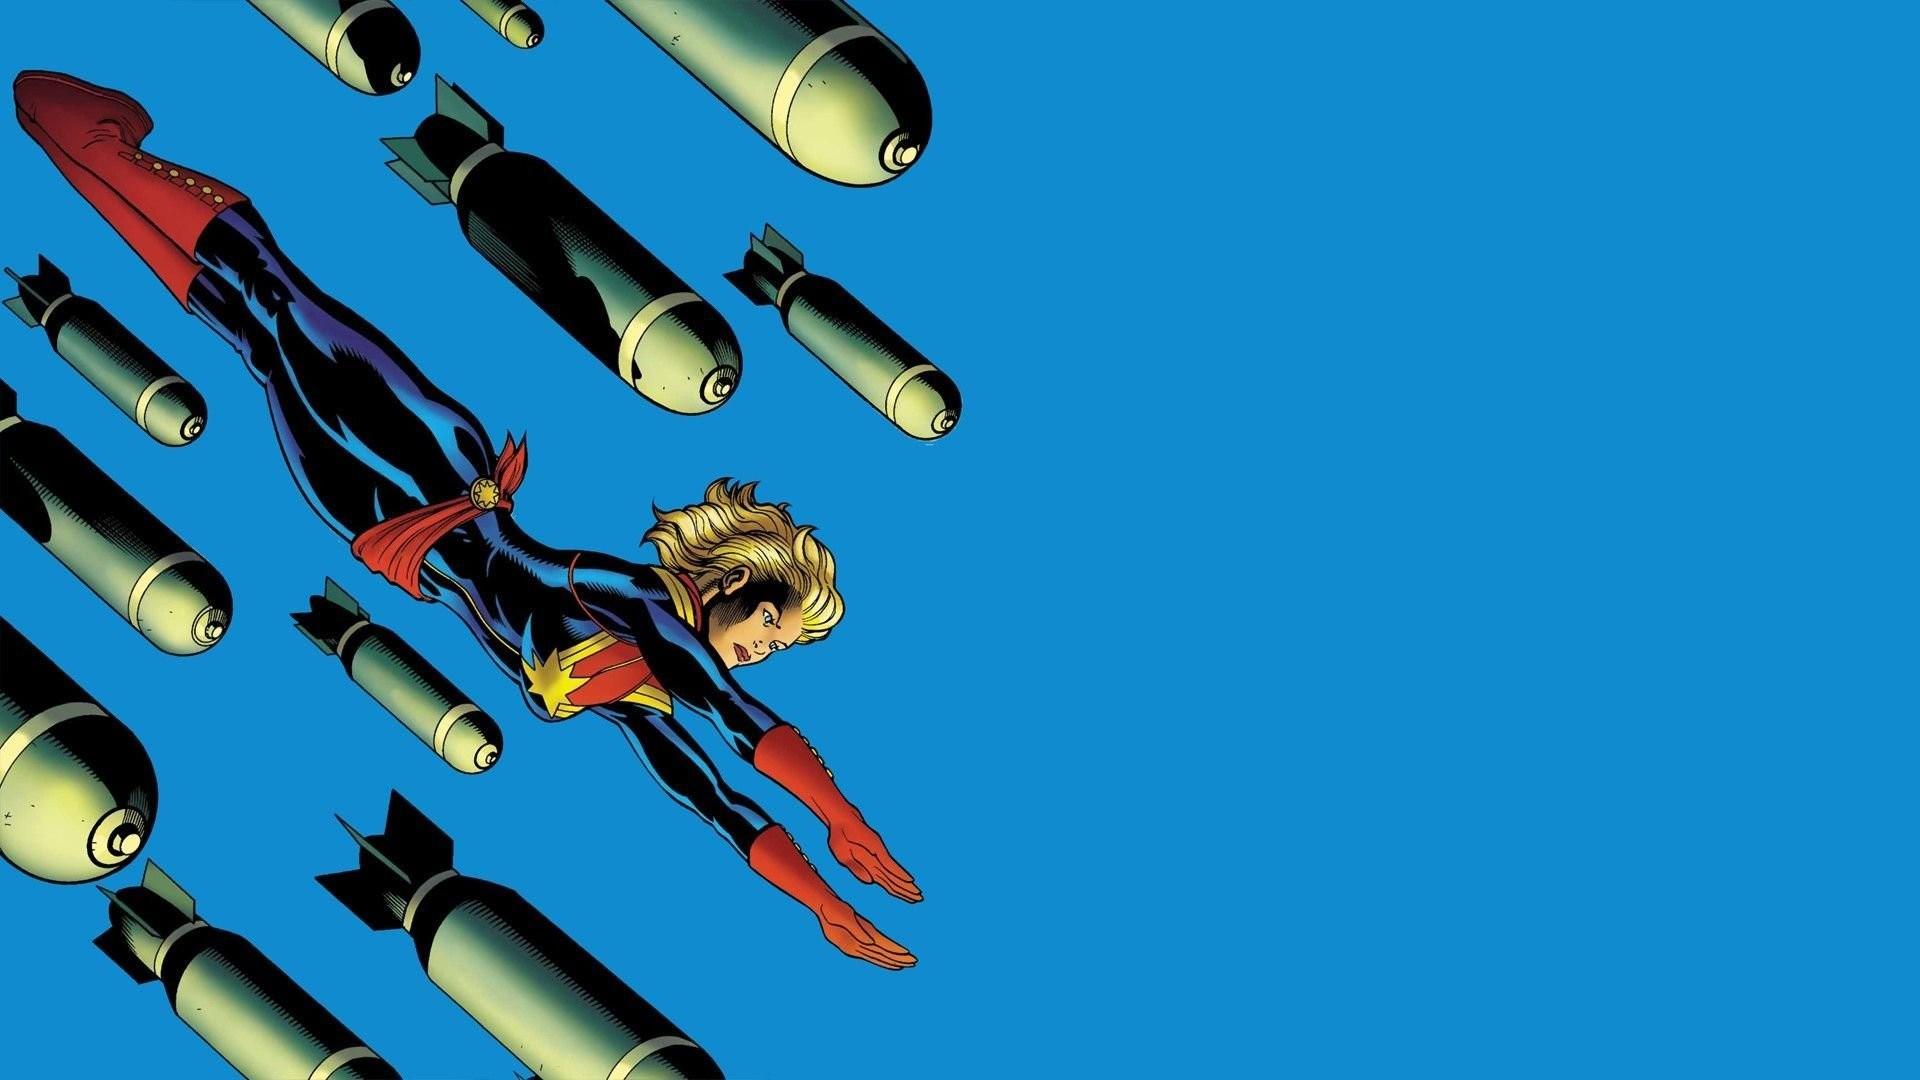 … shazam superhero; cool marvel wallpapers wallpapers browse; captain  marvel 927395 walldevil …